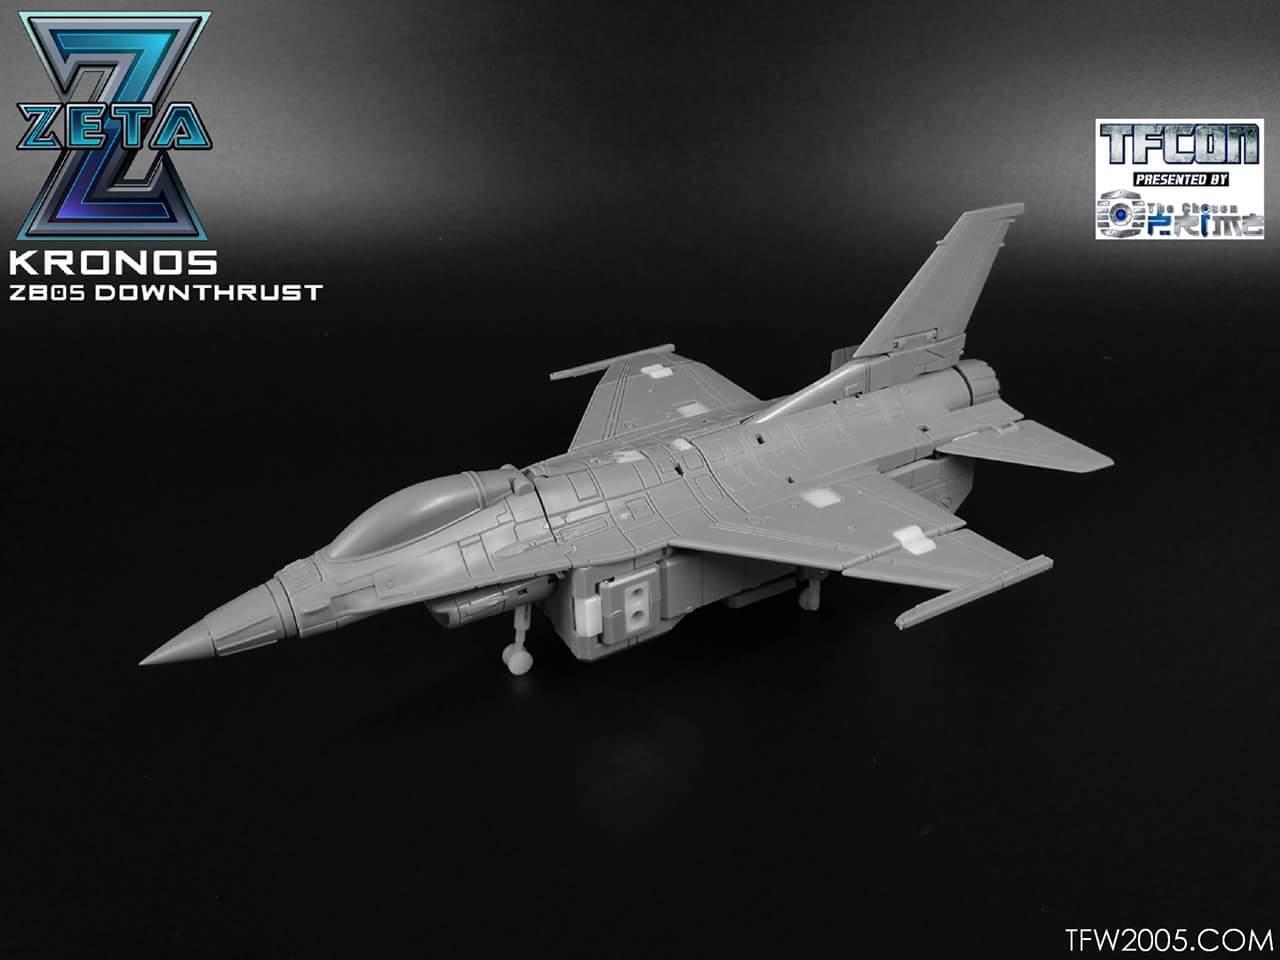 [Zeta Toys] Produit Tiers ― Kronos (ZB-01 à ZB-05) ― ZB-06|ZB-07 Superitron ― aka Superion - Page 2 Pj4eb1p3_o